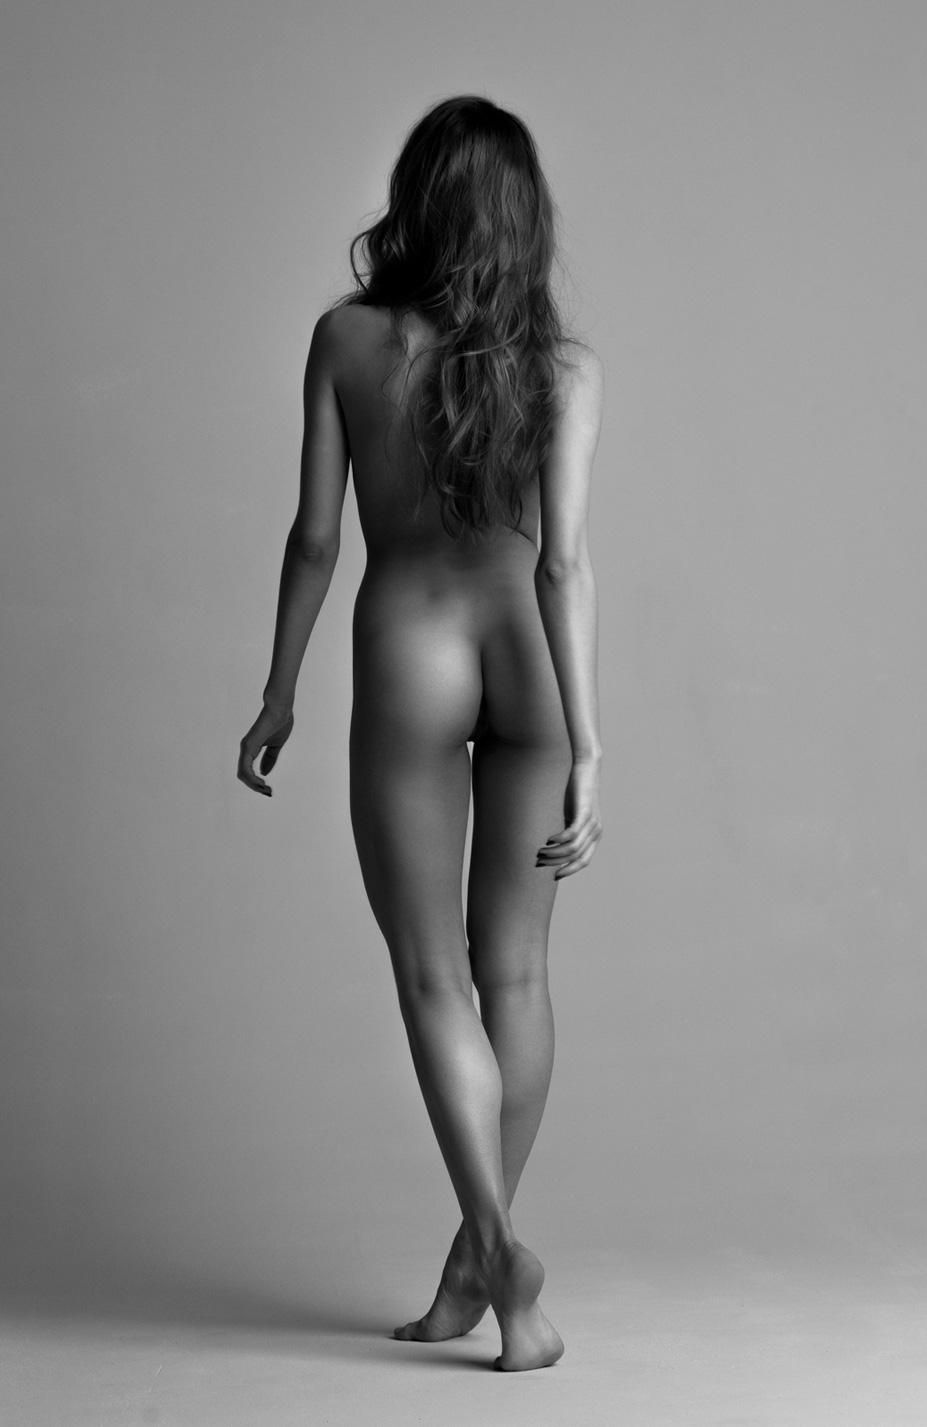 Katya.Aivazova nude by Mikhail Malyugin - Yume Magazine